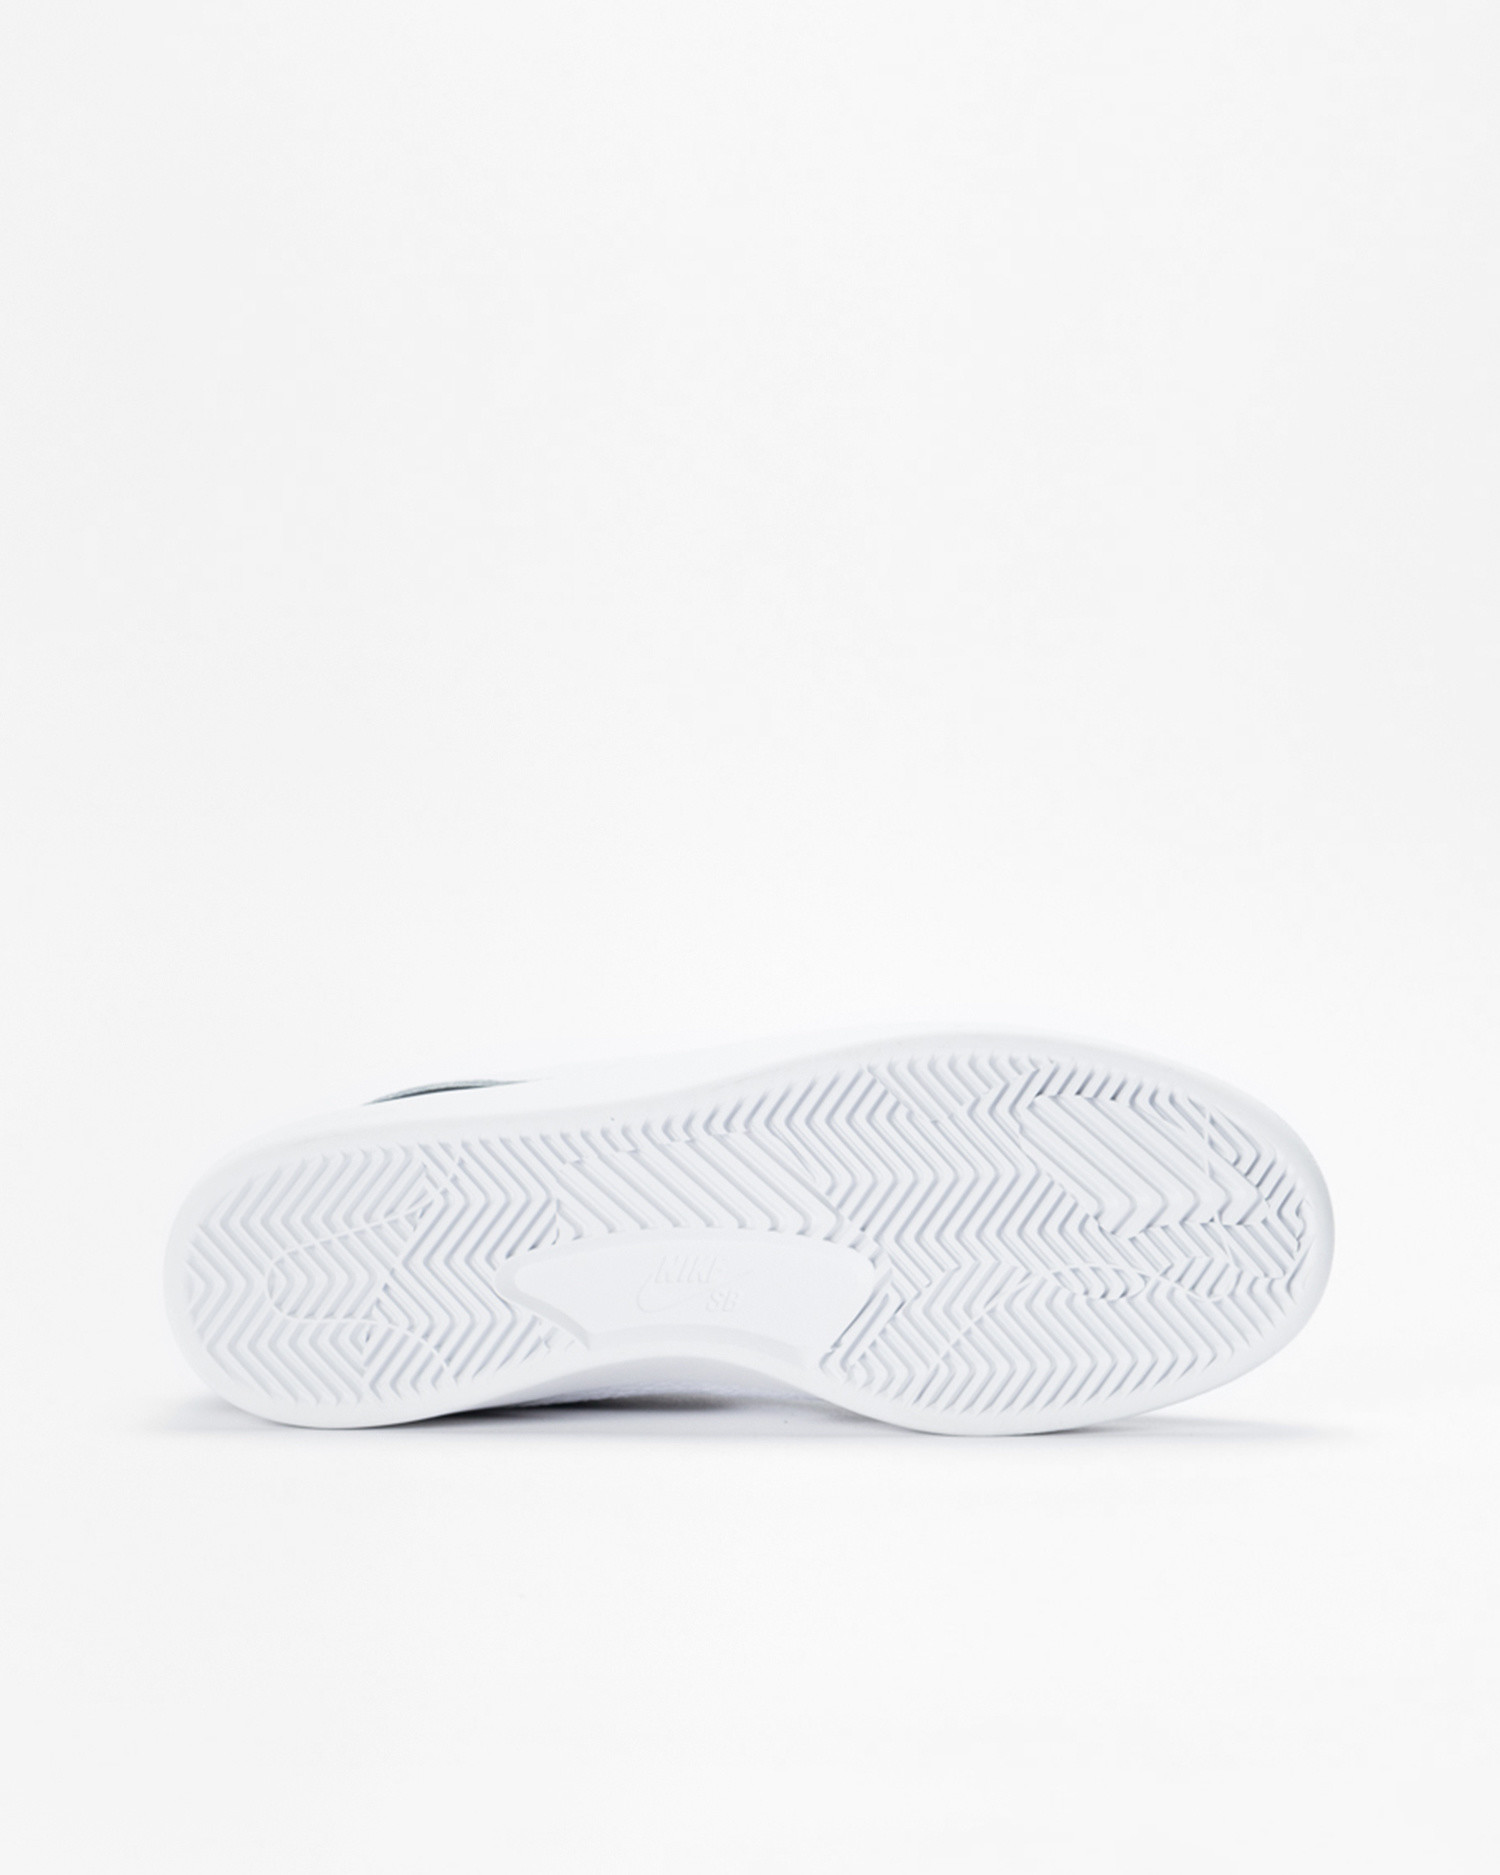 Nike Sb Bruin React Black/White